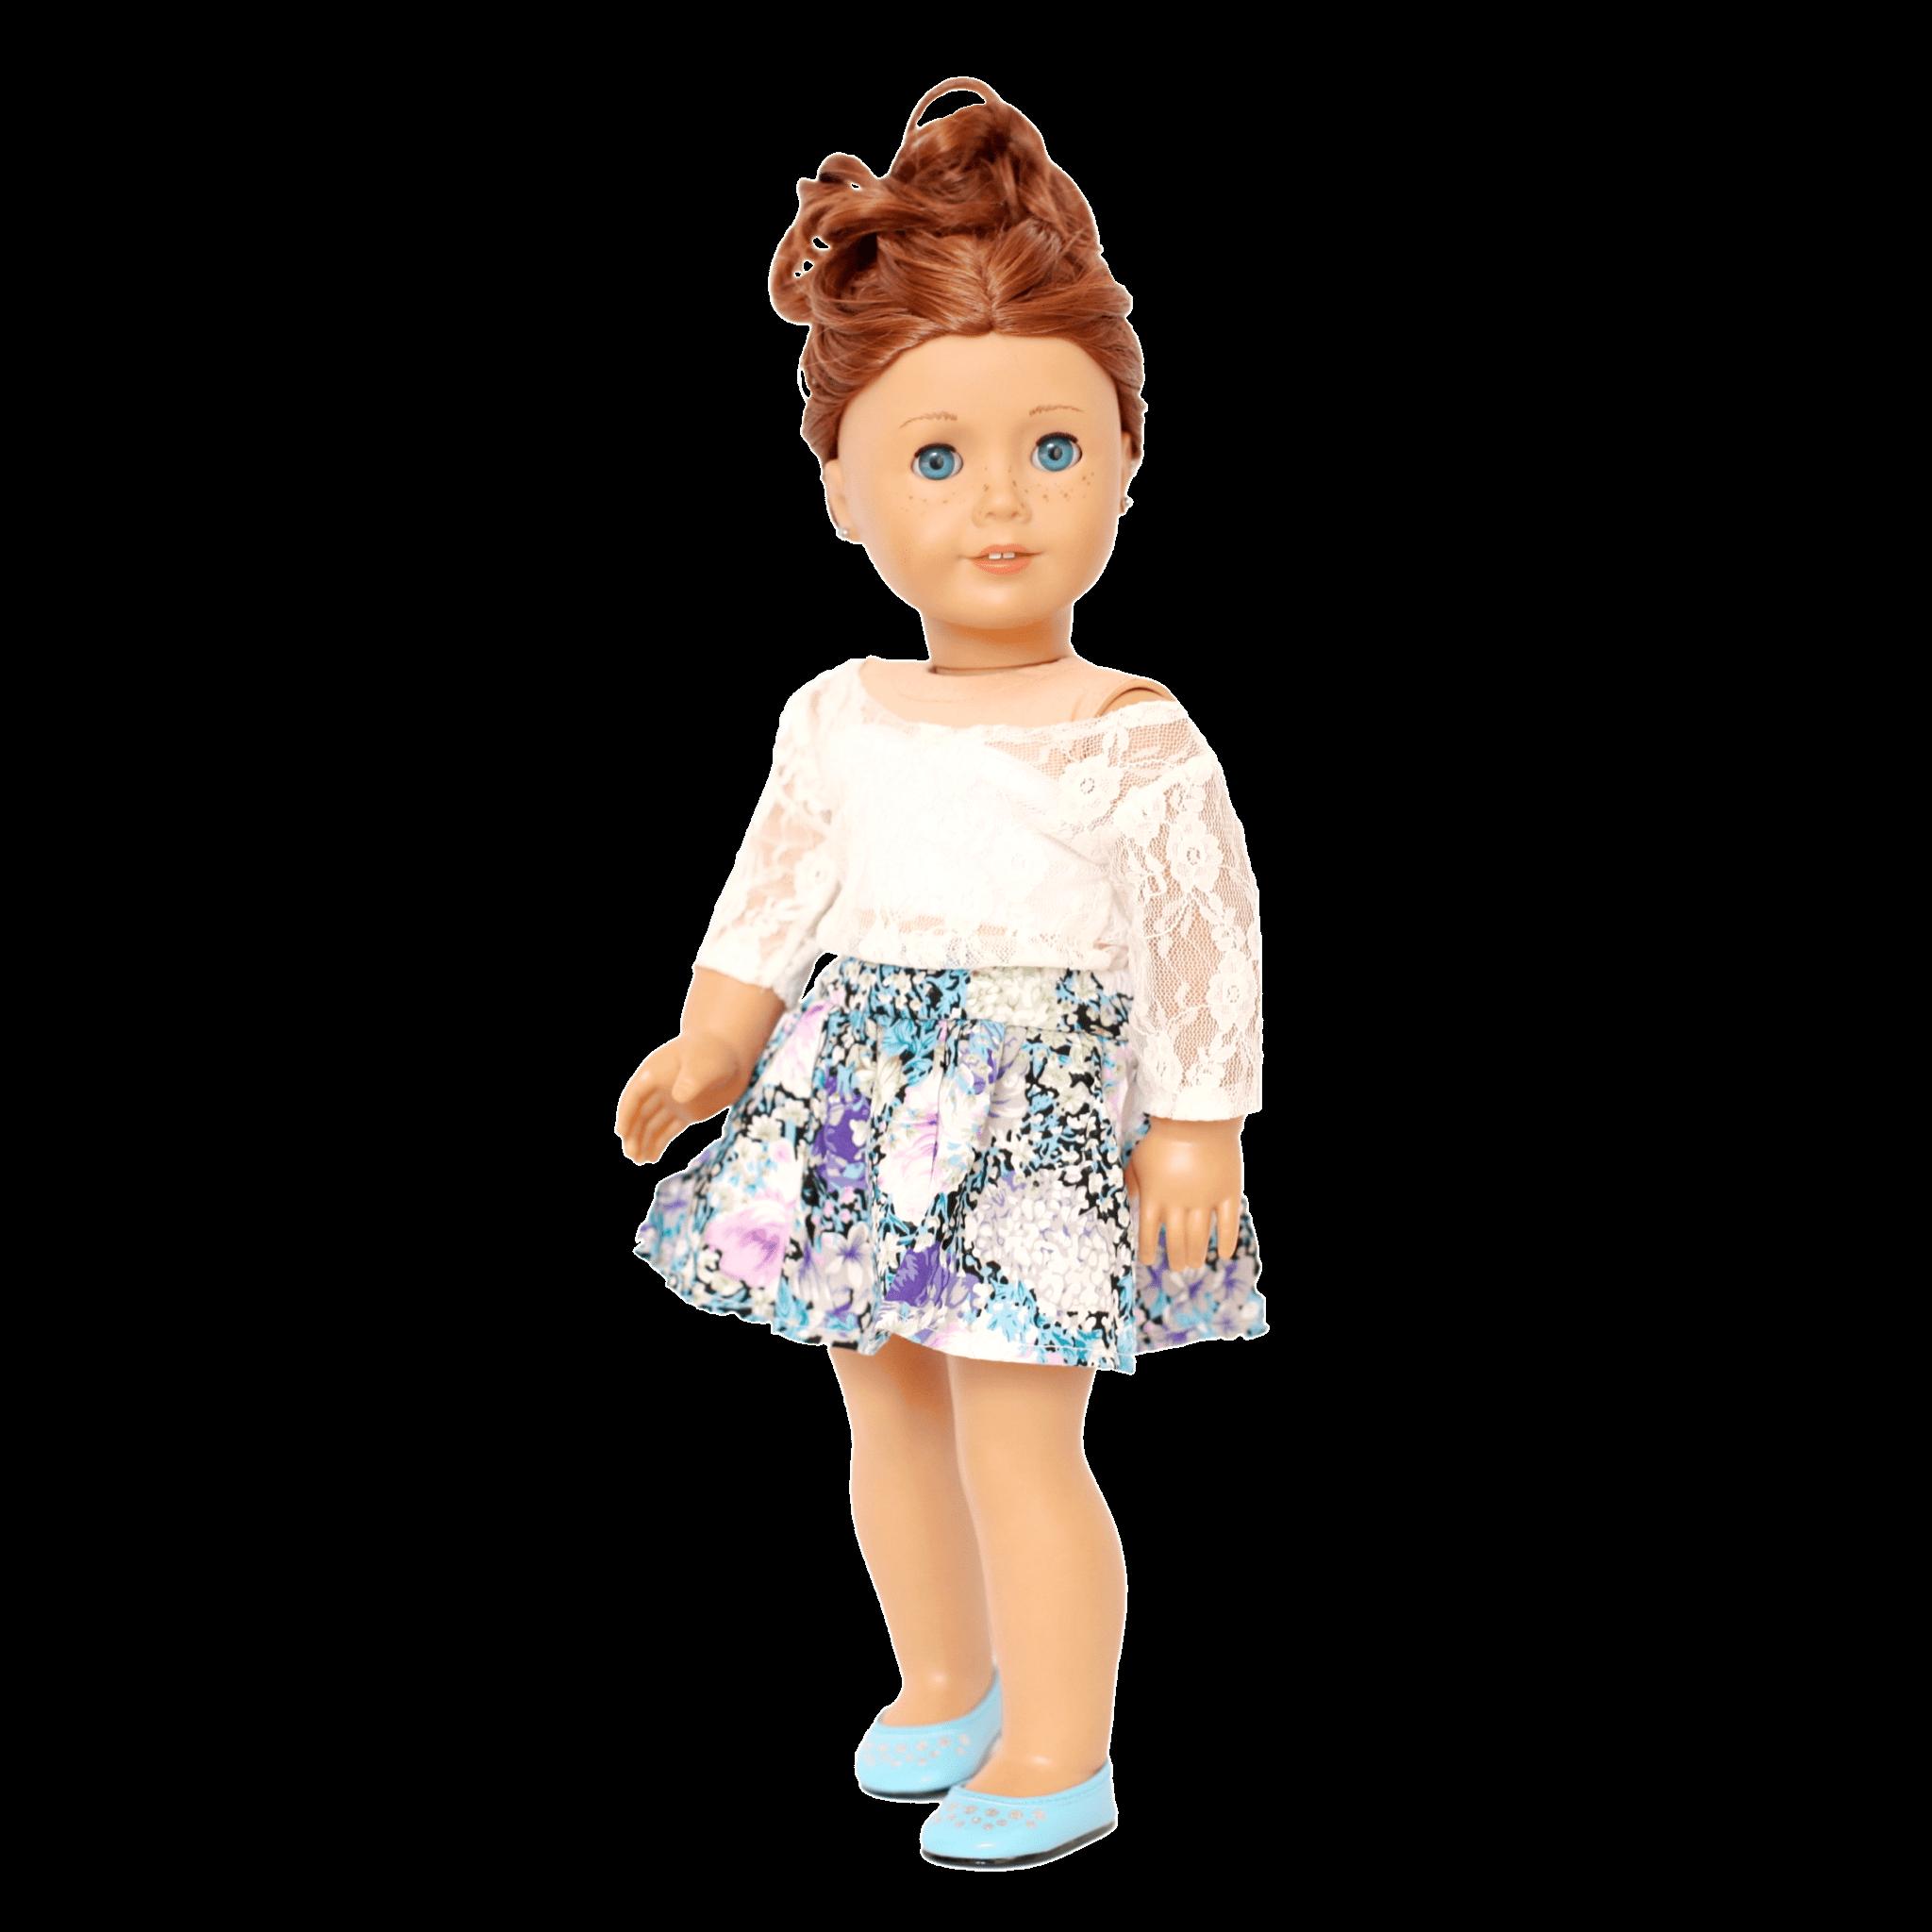 american girl doll saige copeland jasmine copeland